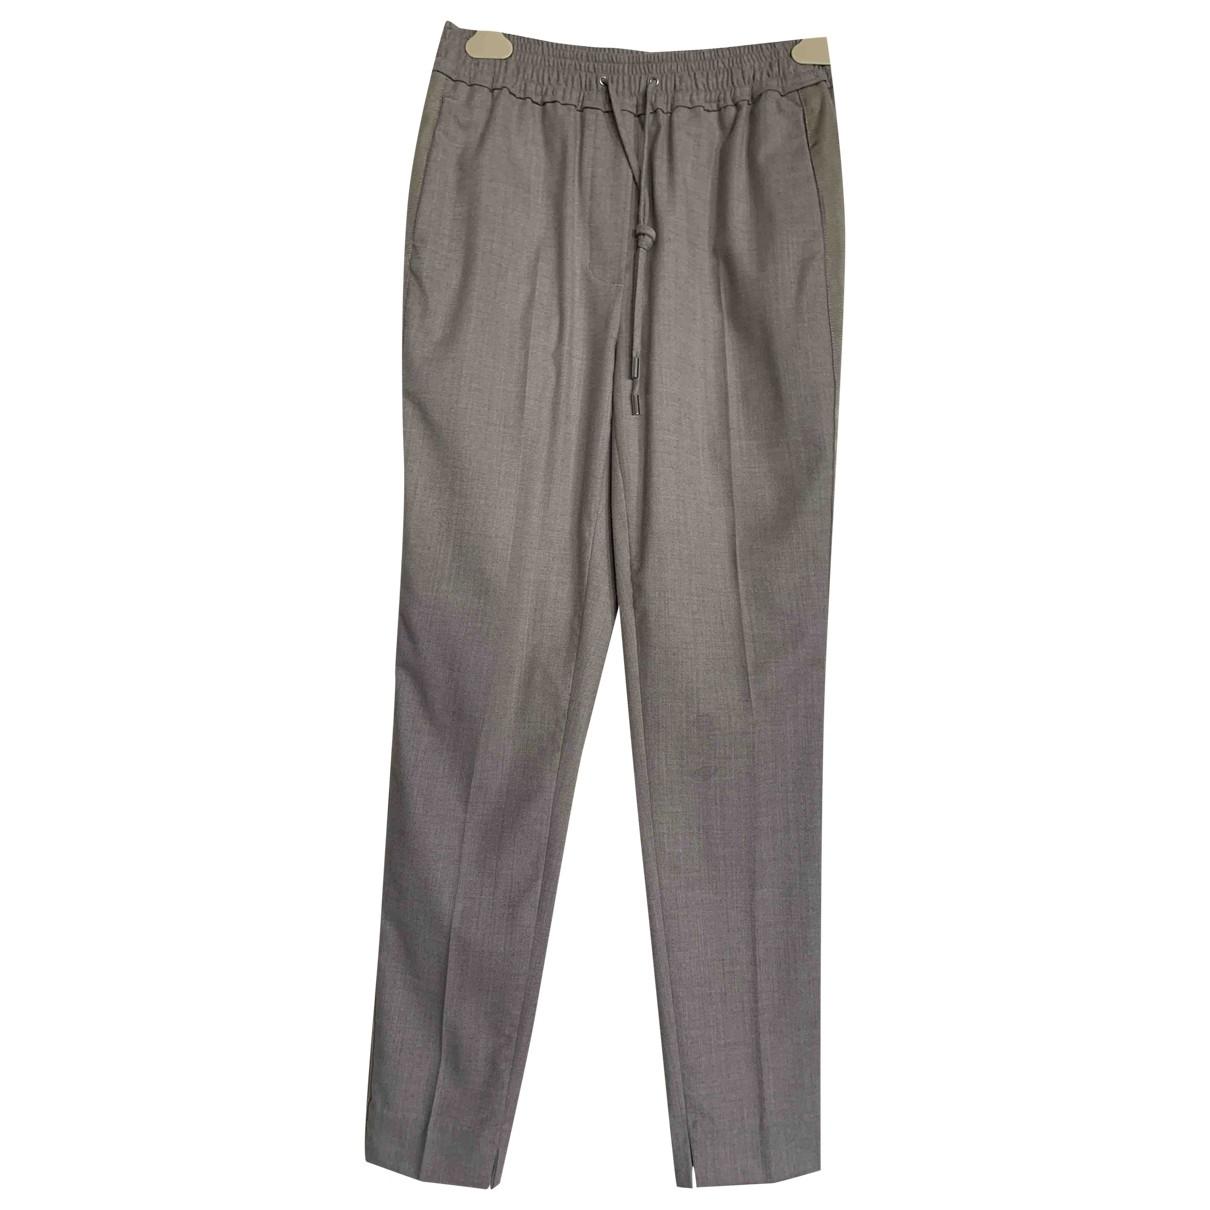 3.1 Phillip Lim \N Beige Wool Trousers for Women 4 US